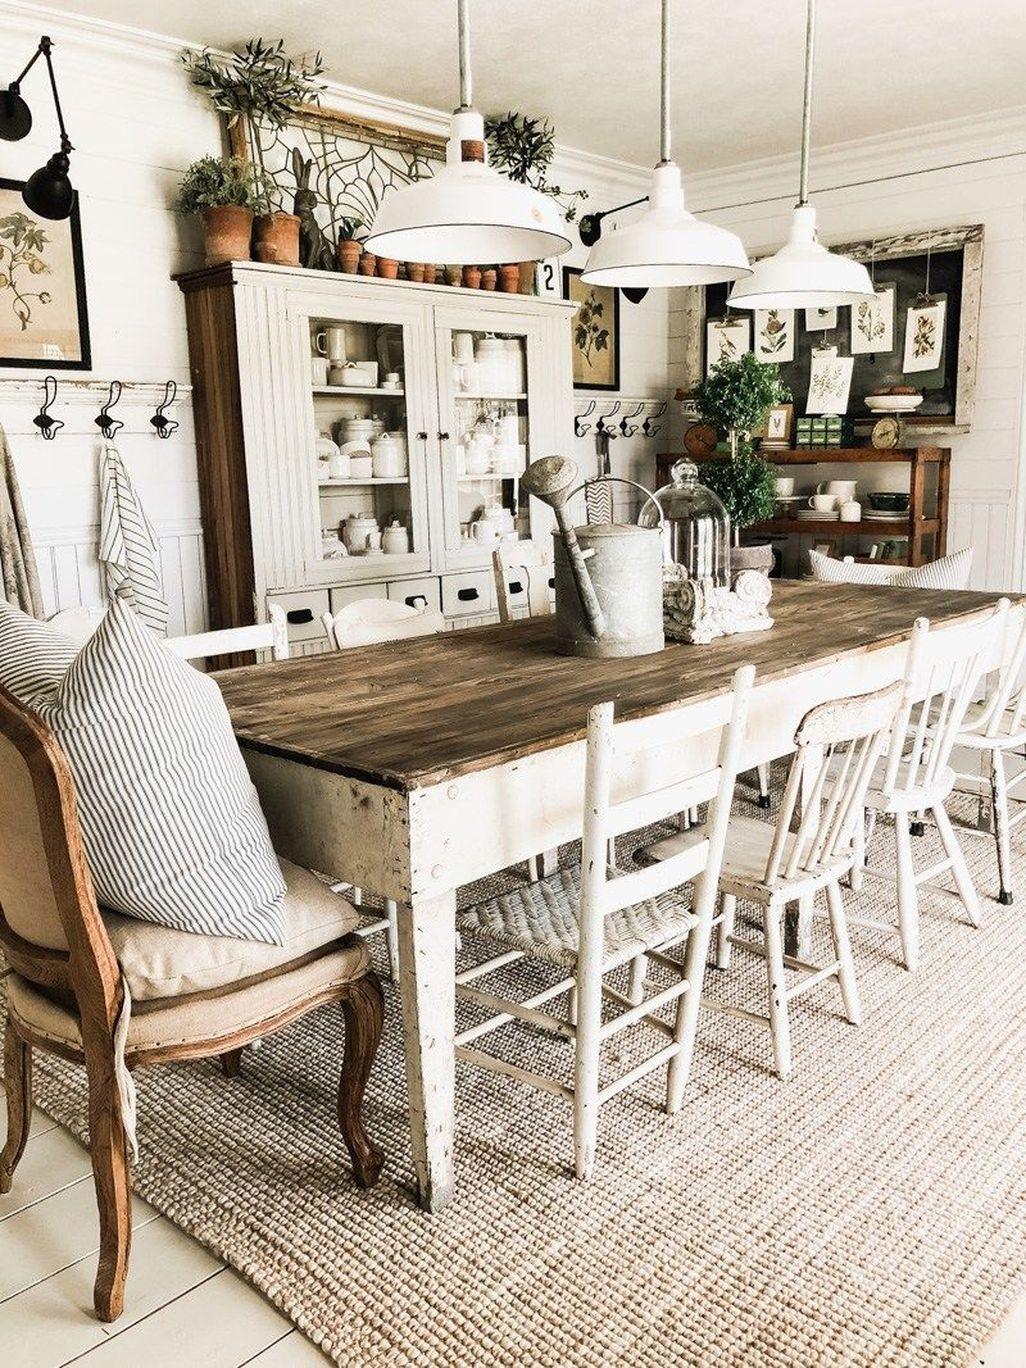 Captivating Dining Room Tables Design Ideas21